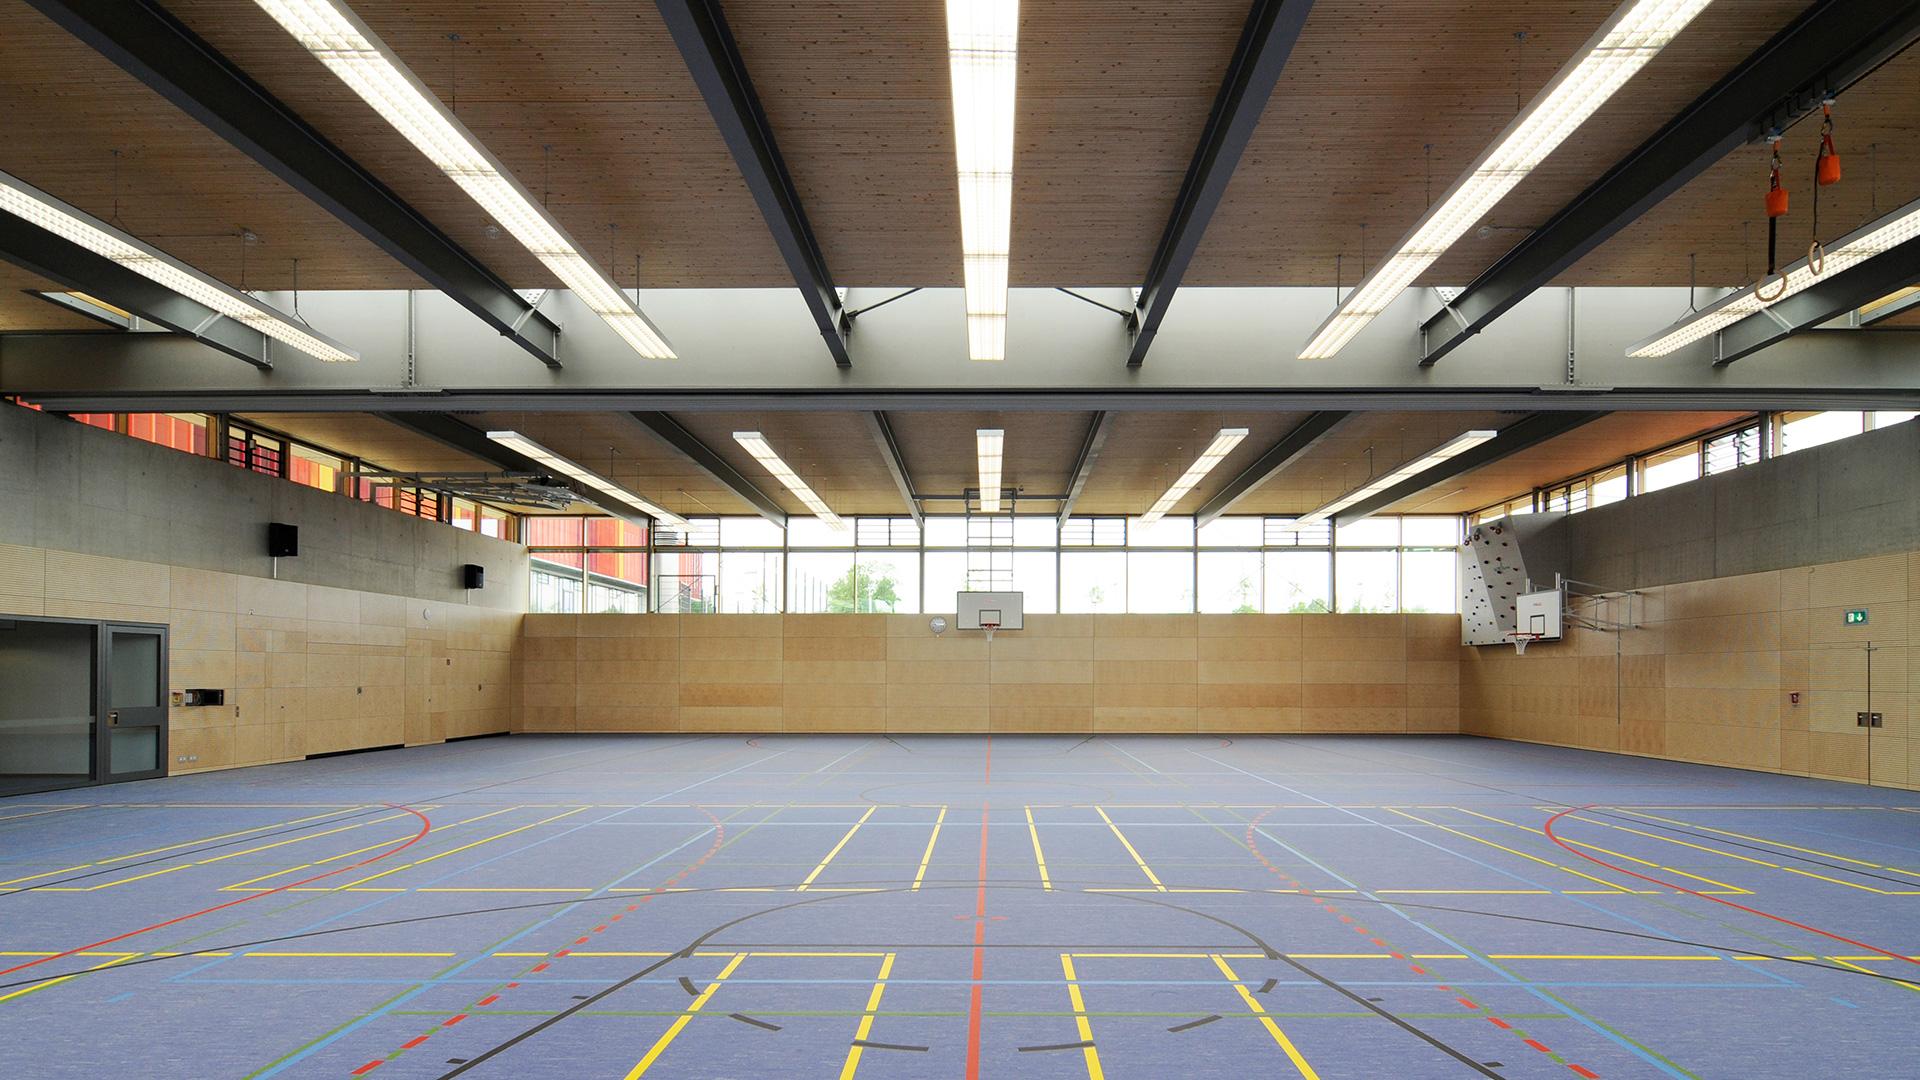 Sporthalle Neubiberg Halle